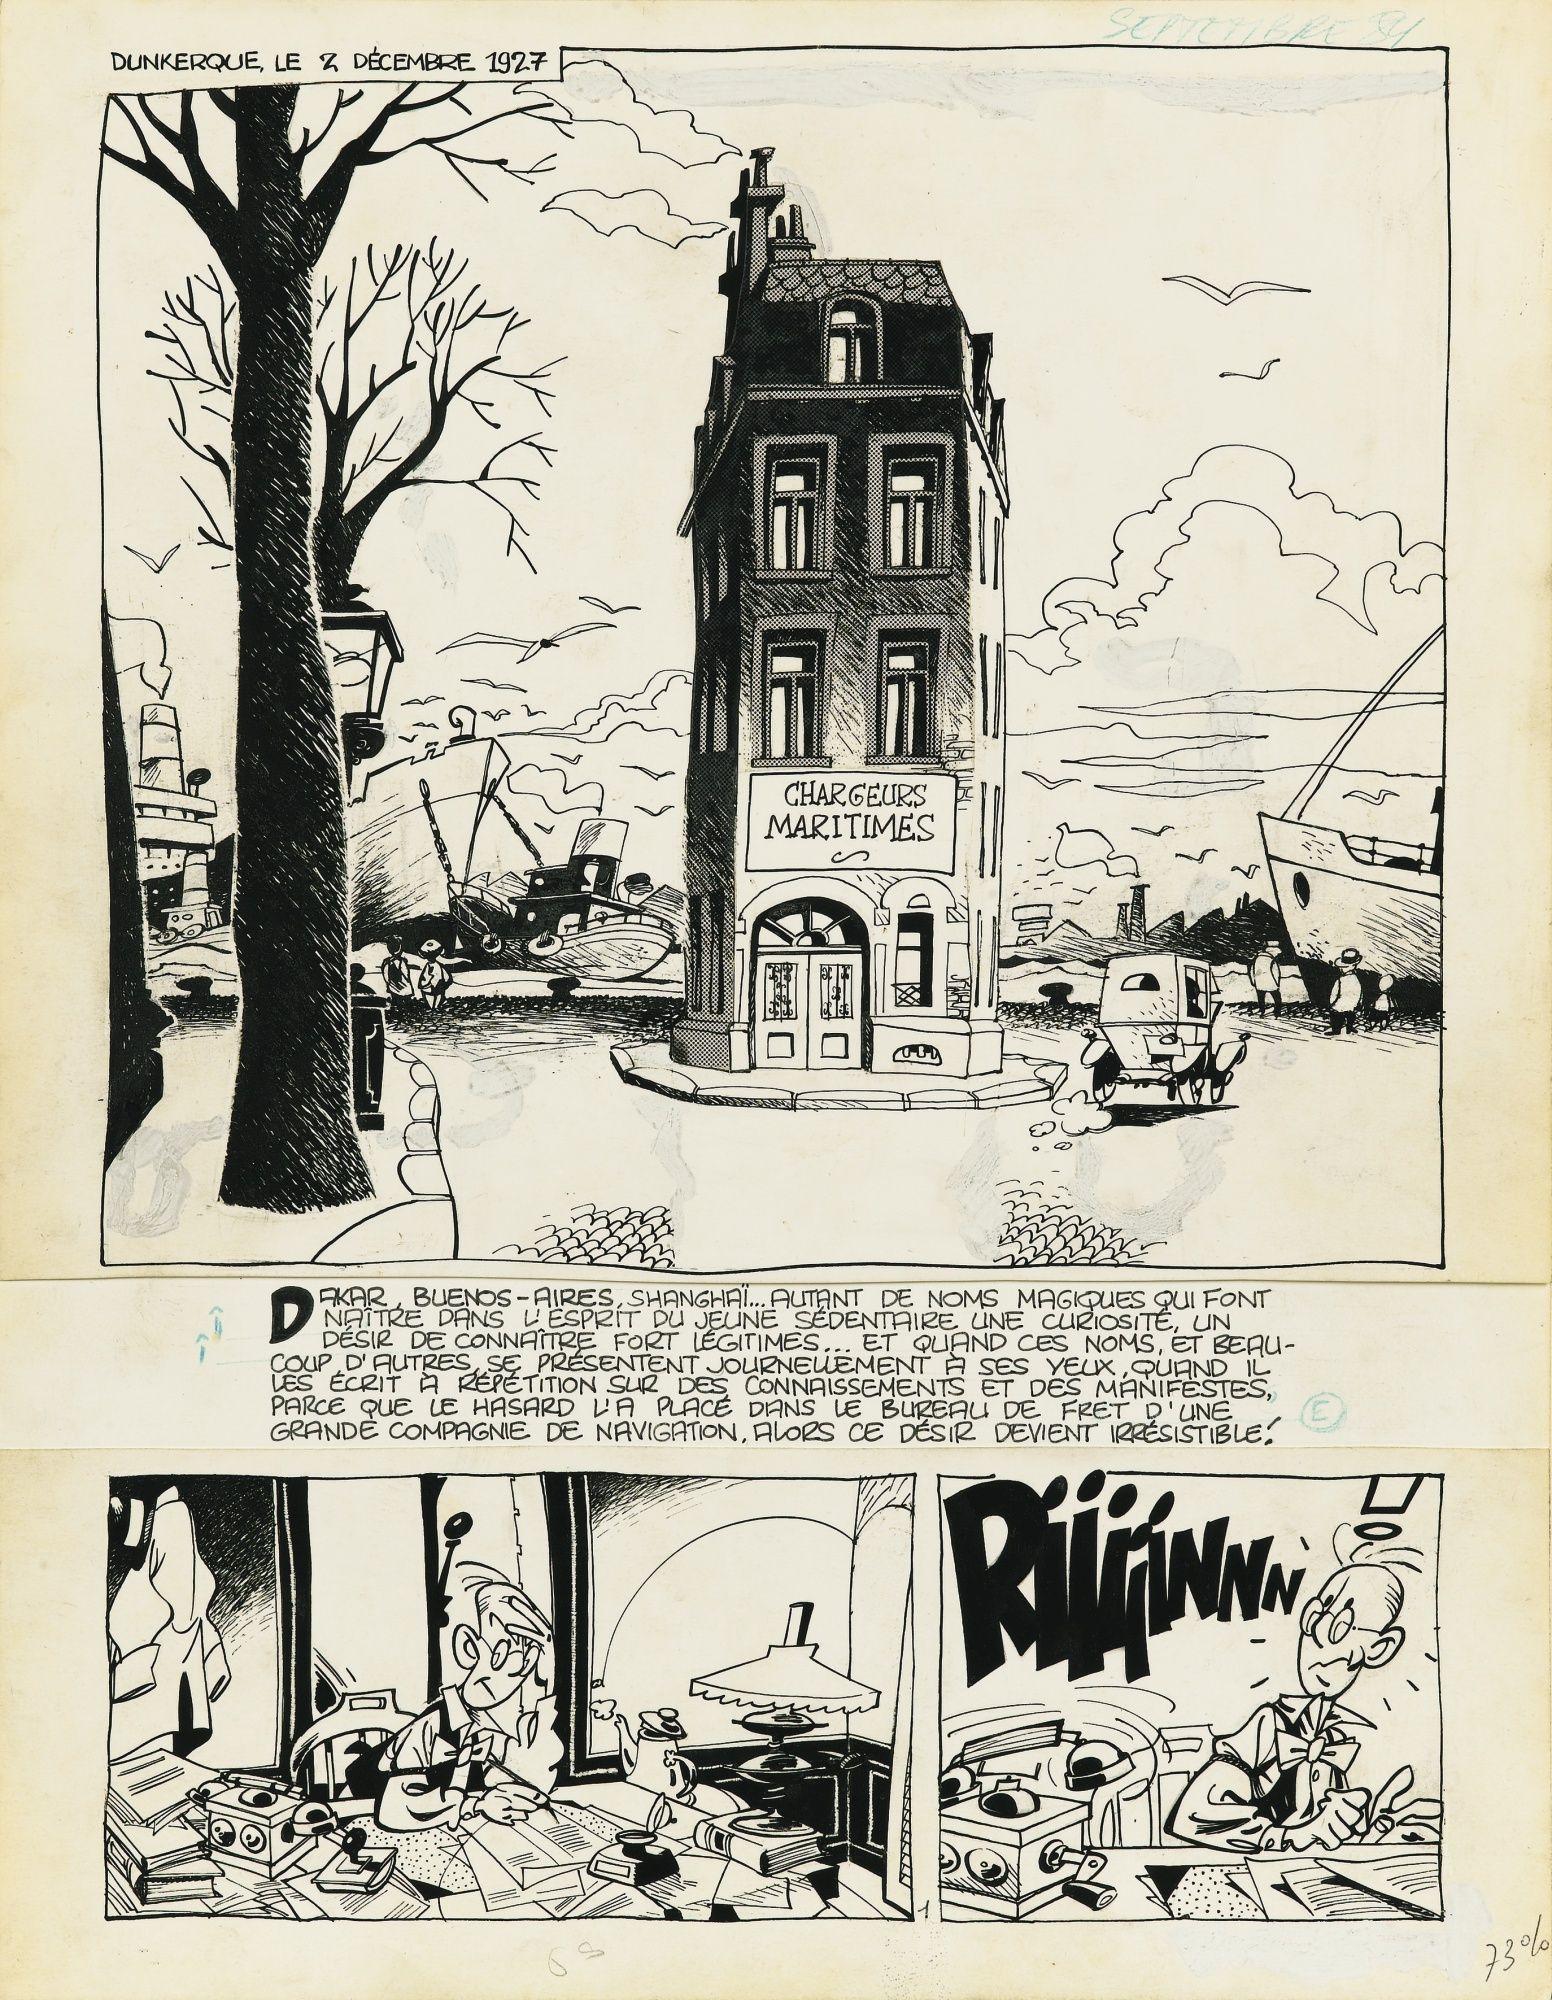 Le Gall Frank Theodore Poussin T Sotheby S Pf1755lot99gvqen Bande Dessinee Dessin Bd Comics